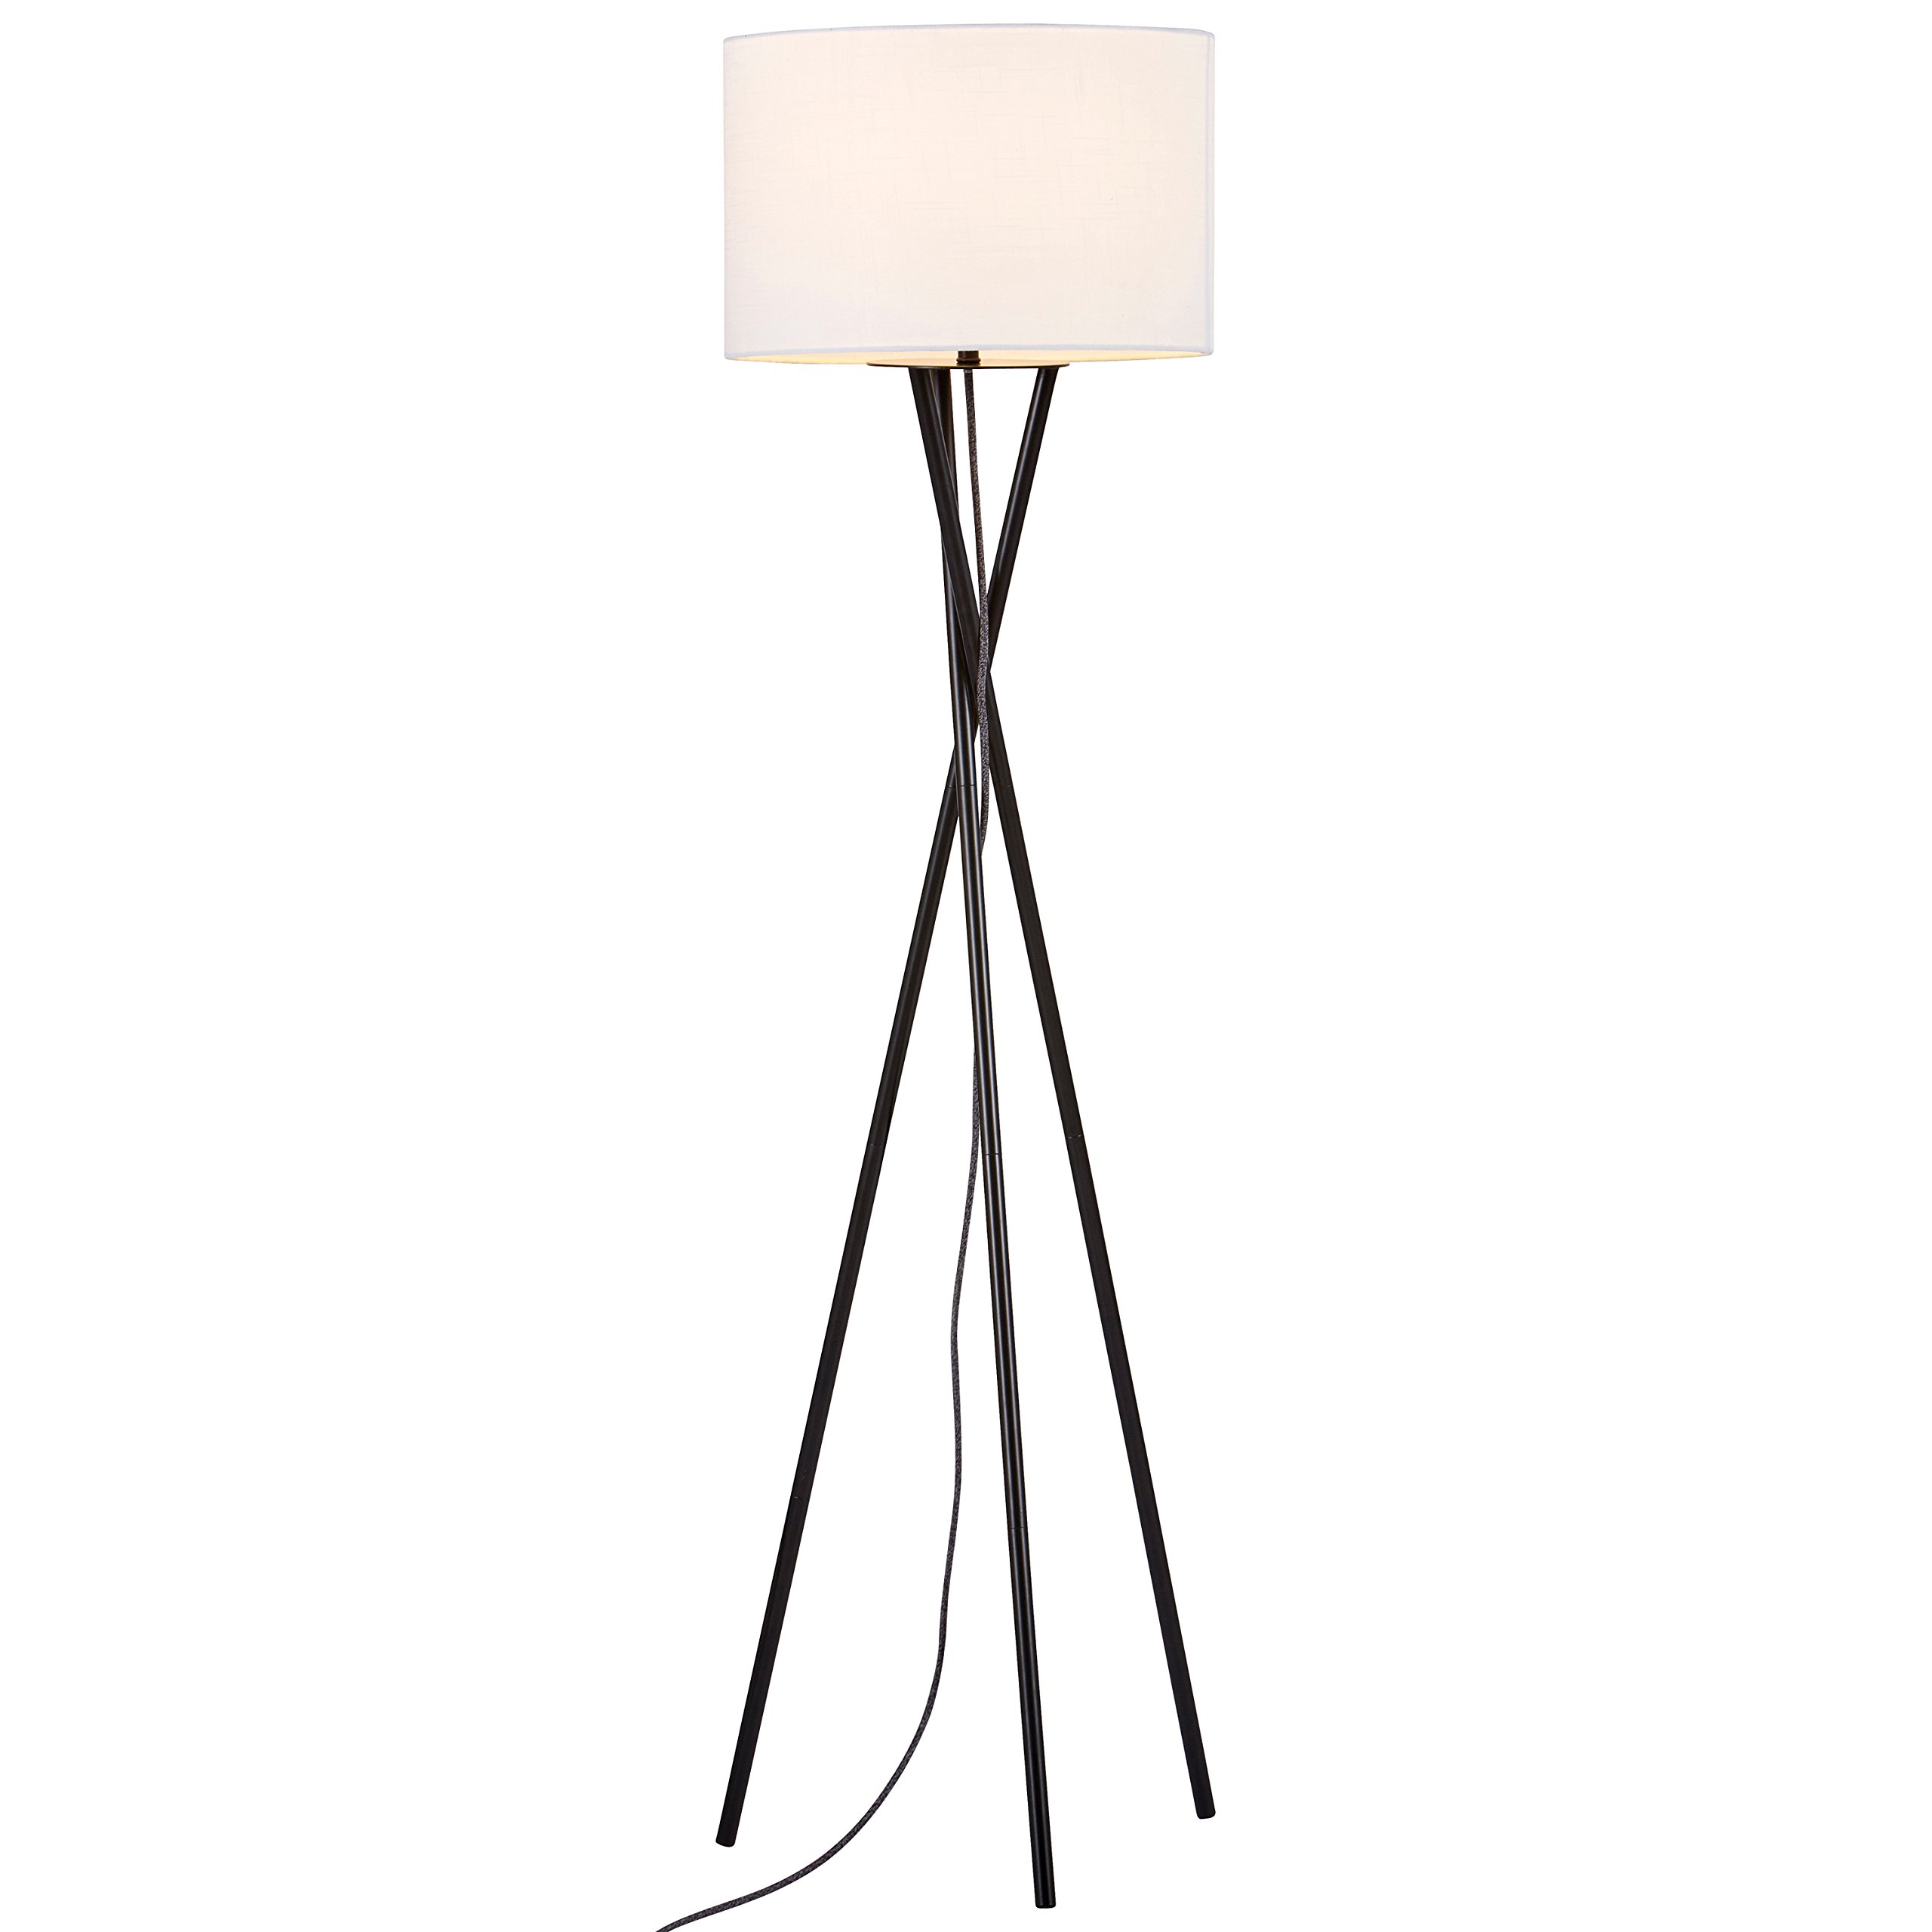 "Rivet Metal Tripod Floor Lamp, With Bulb, Linen Shade, 64"" x 17"" x 17"" , Black"